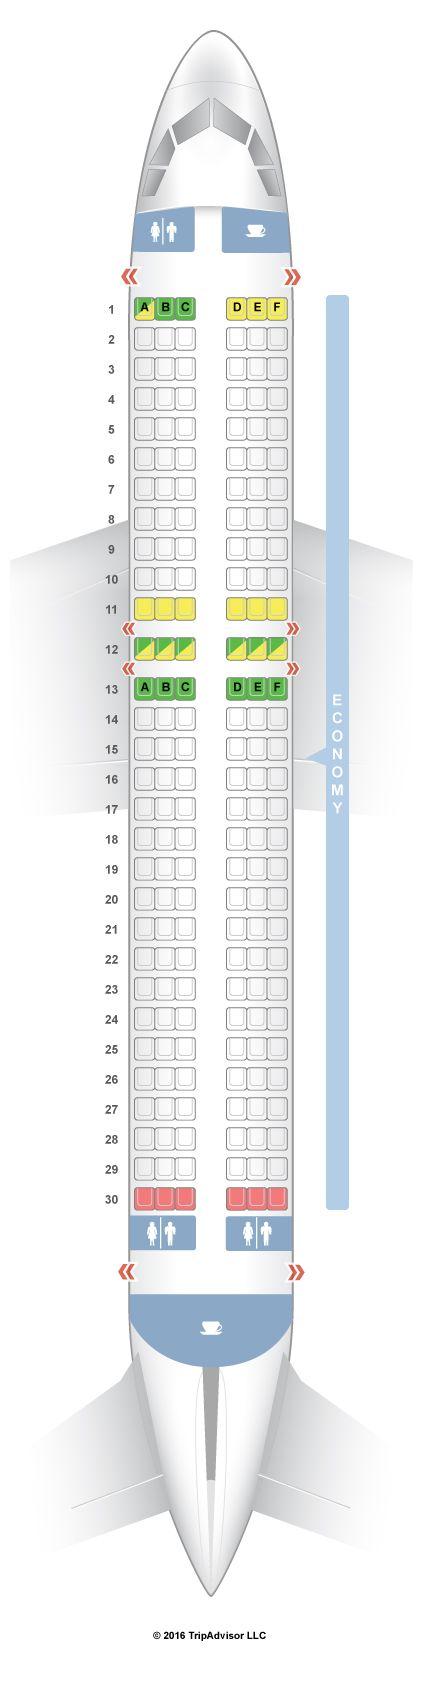 Seatguru Seat Map Jetstar Airbus A320 320 Seatguru Ryanair